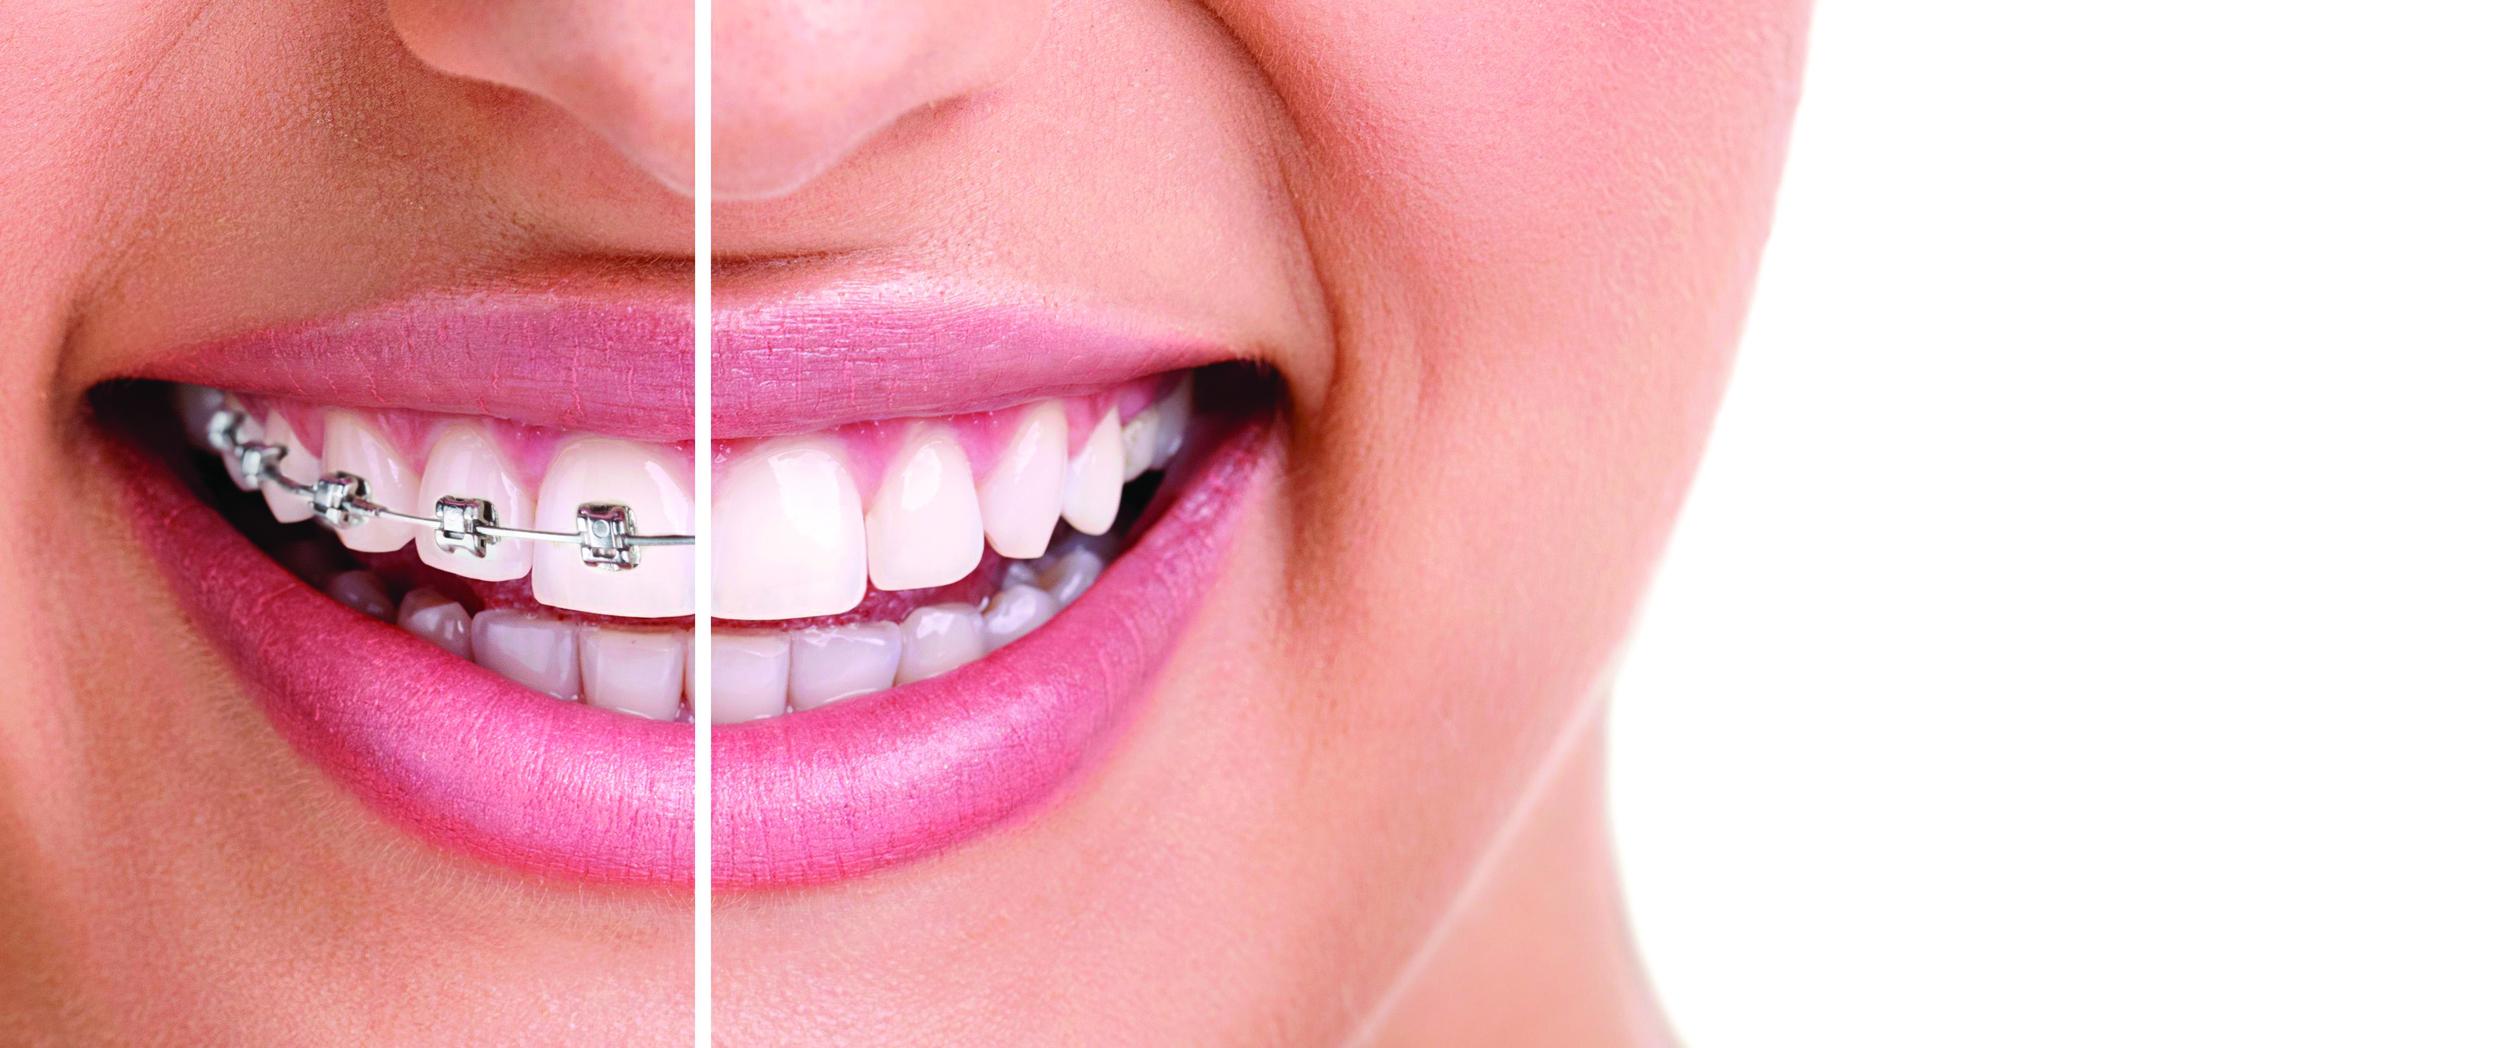 Invisalign clear braces expressions orthodontics braces or invisaligng solutioingenieria Images